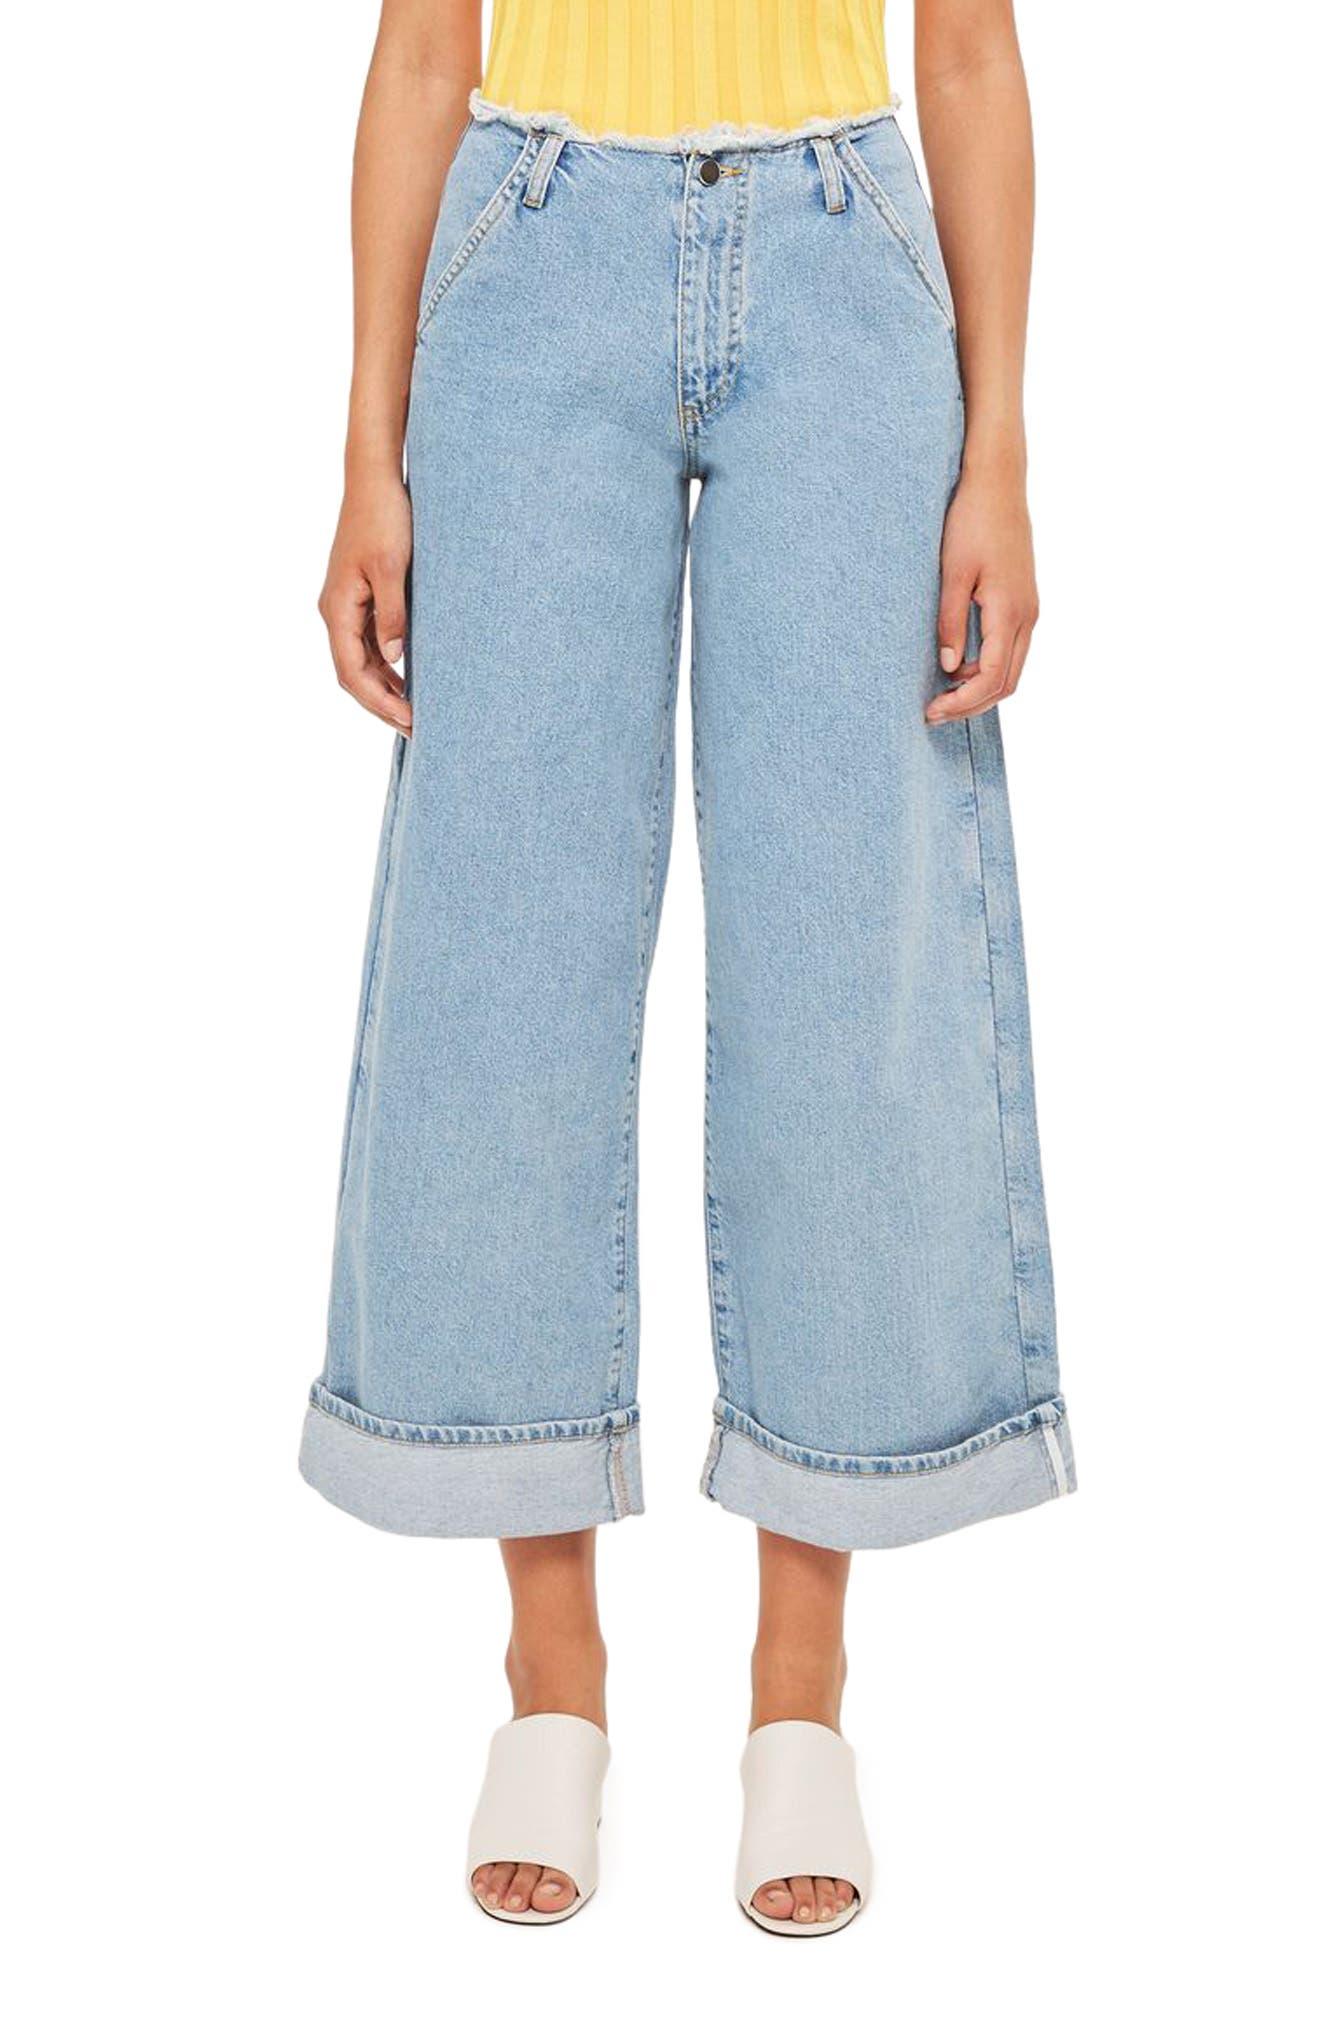 Main Image - Topshop Boutique Frayed Waist Super Wide Leg Jeans